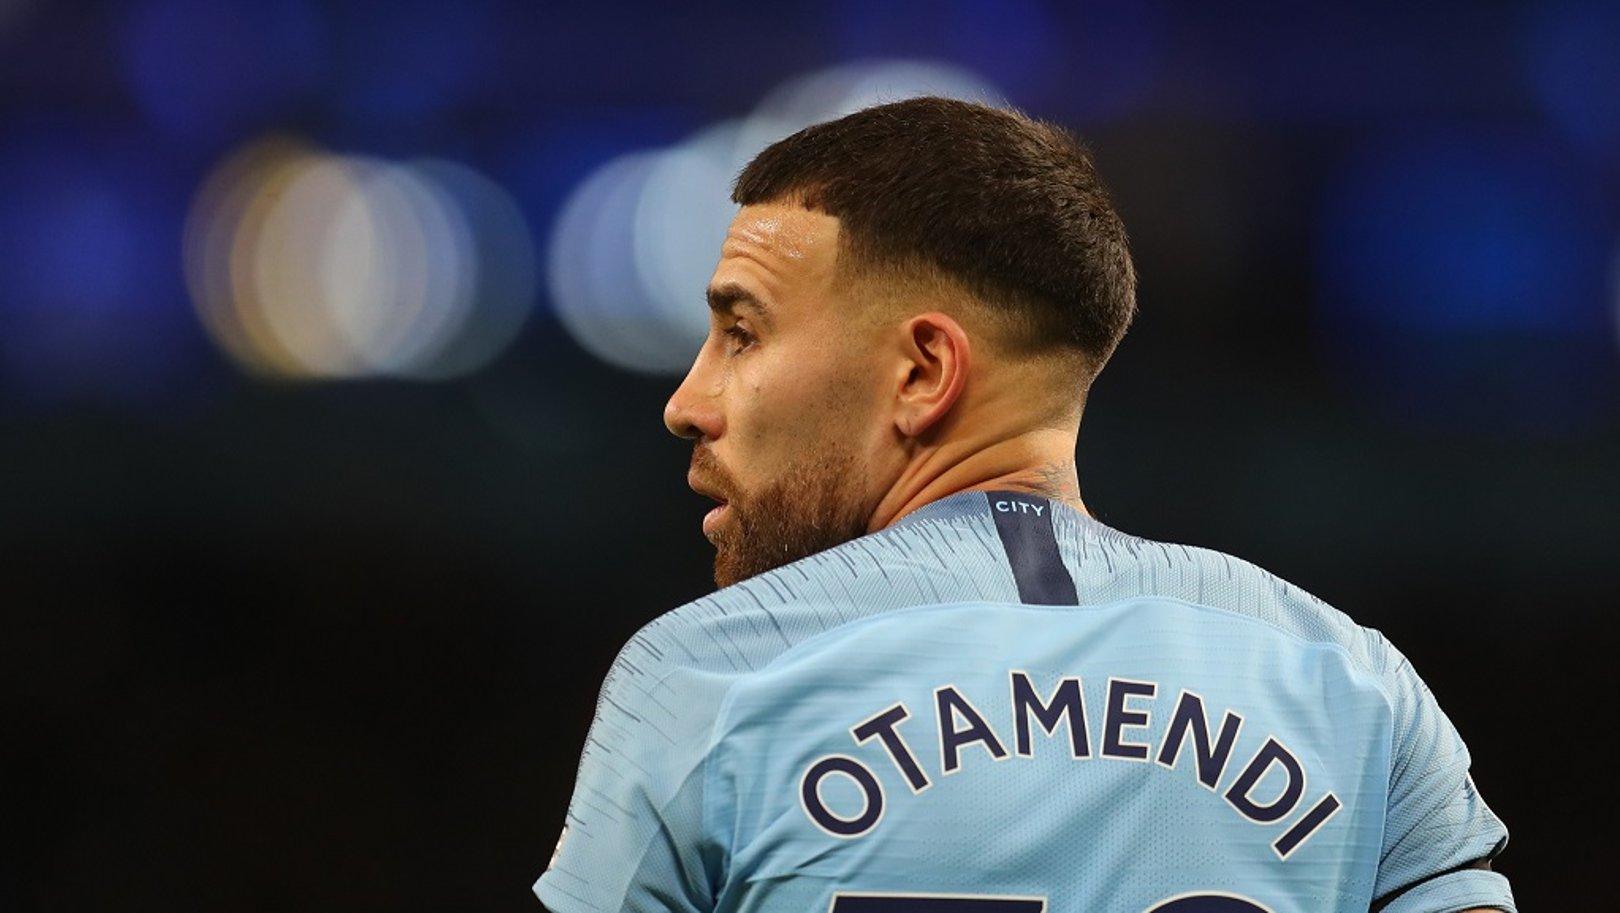 Otamendi says December key to City title challenge